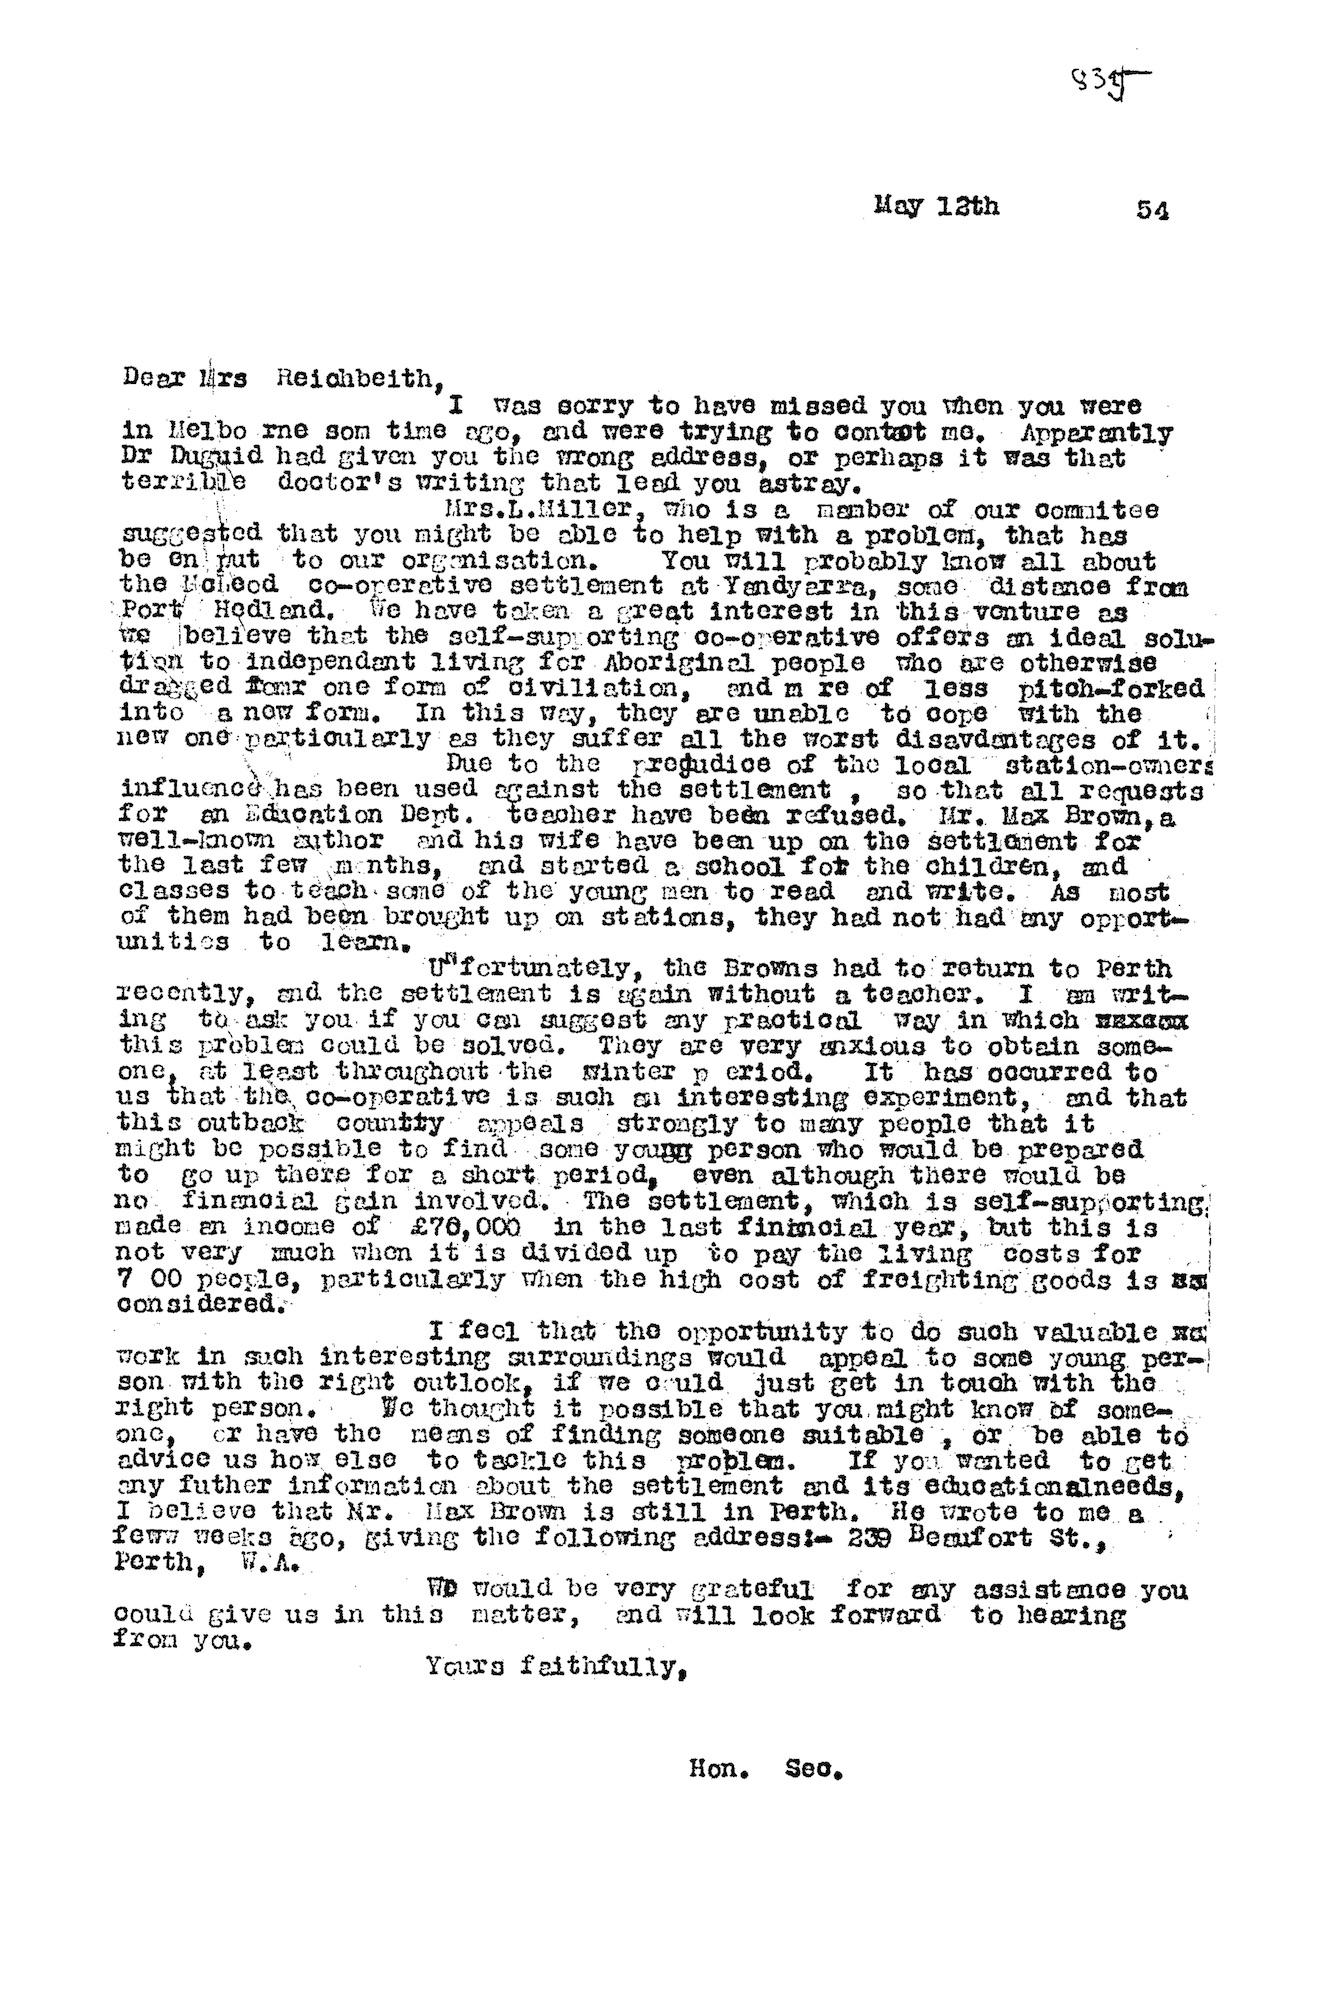 Shirley Andrews to Bessie Rischbieth, 12 May 1954